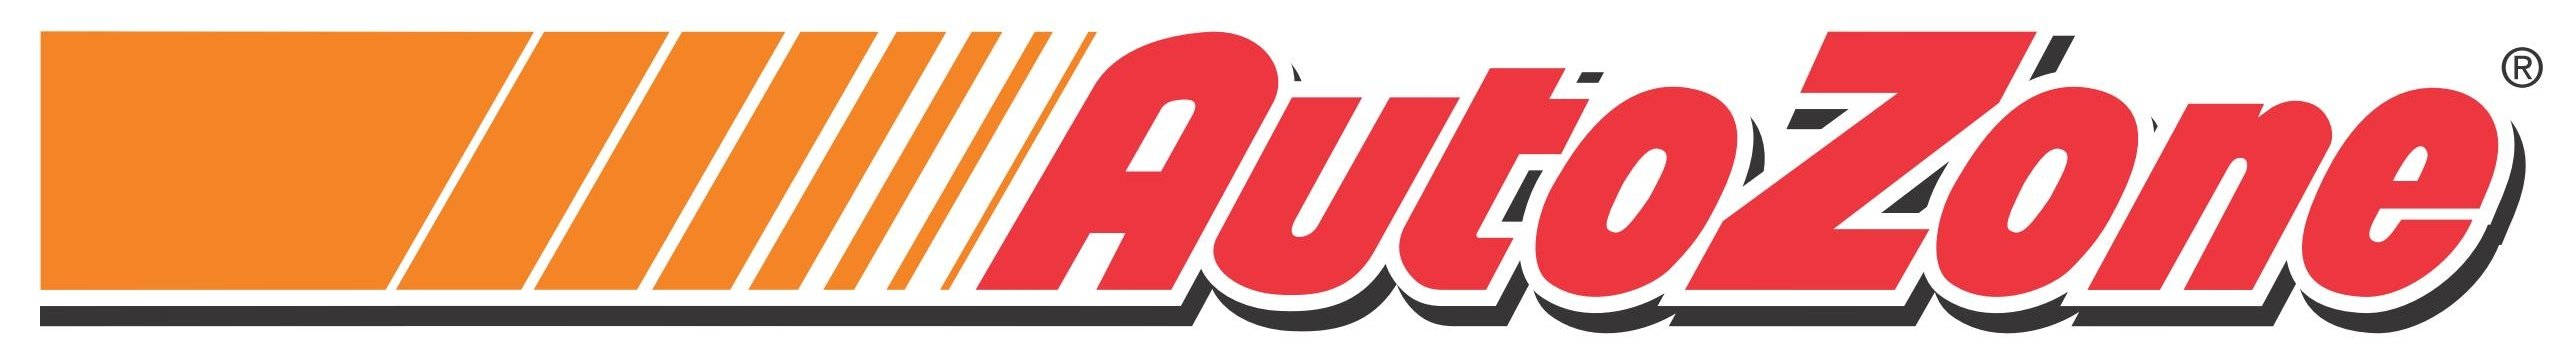 AutoZone Logo [EPS File] Vector EPS Free Download, Logo, Icons, Brand Emblems